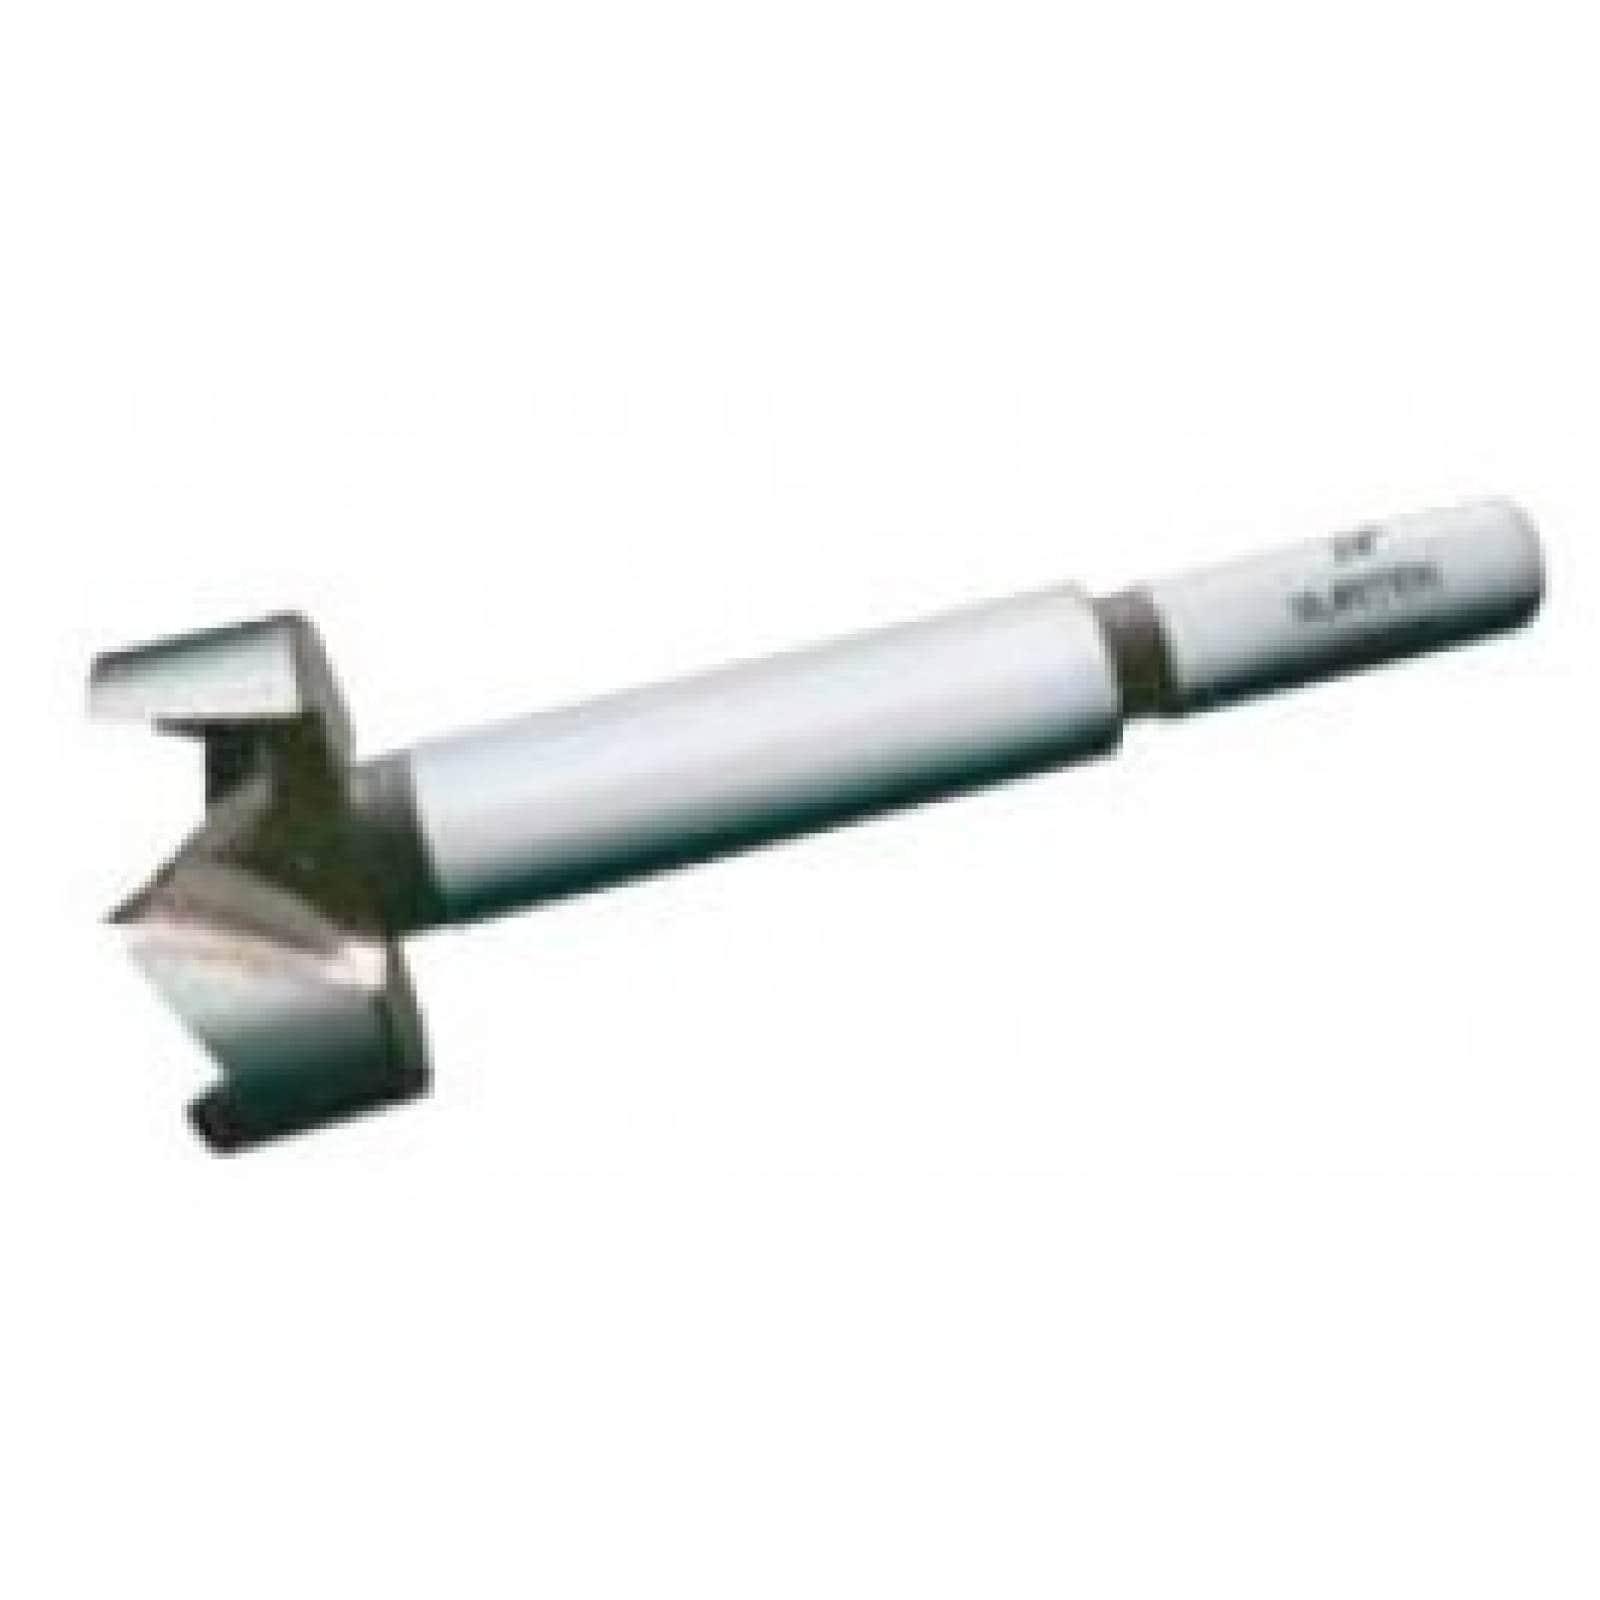 Broca Forstner Madera Sacabocado M42922 1 3/8 Pulg Vice/Grip